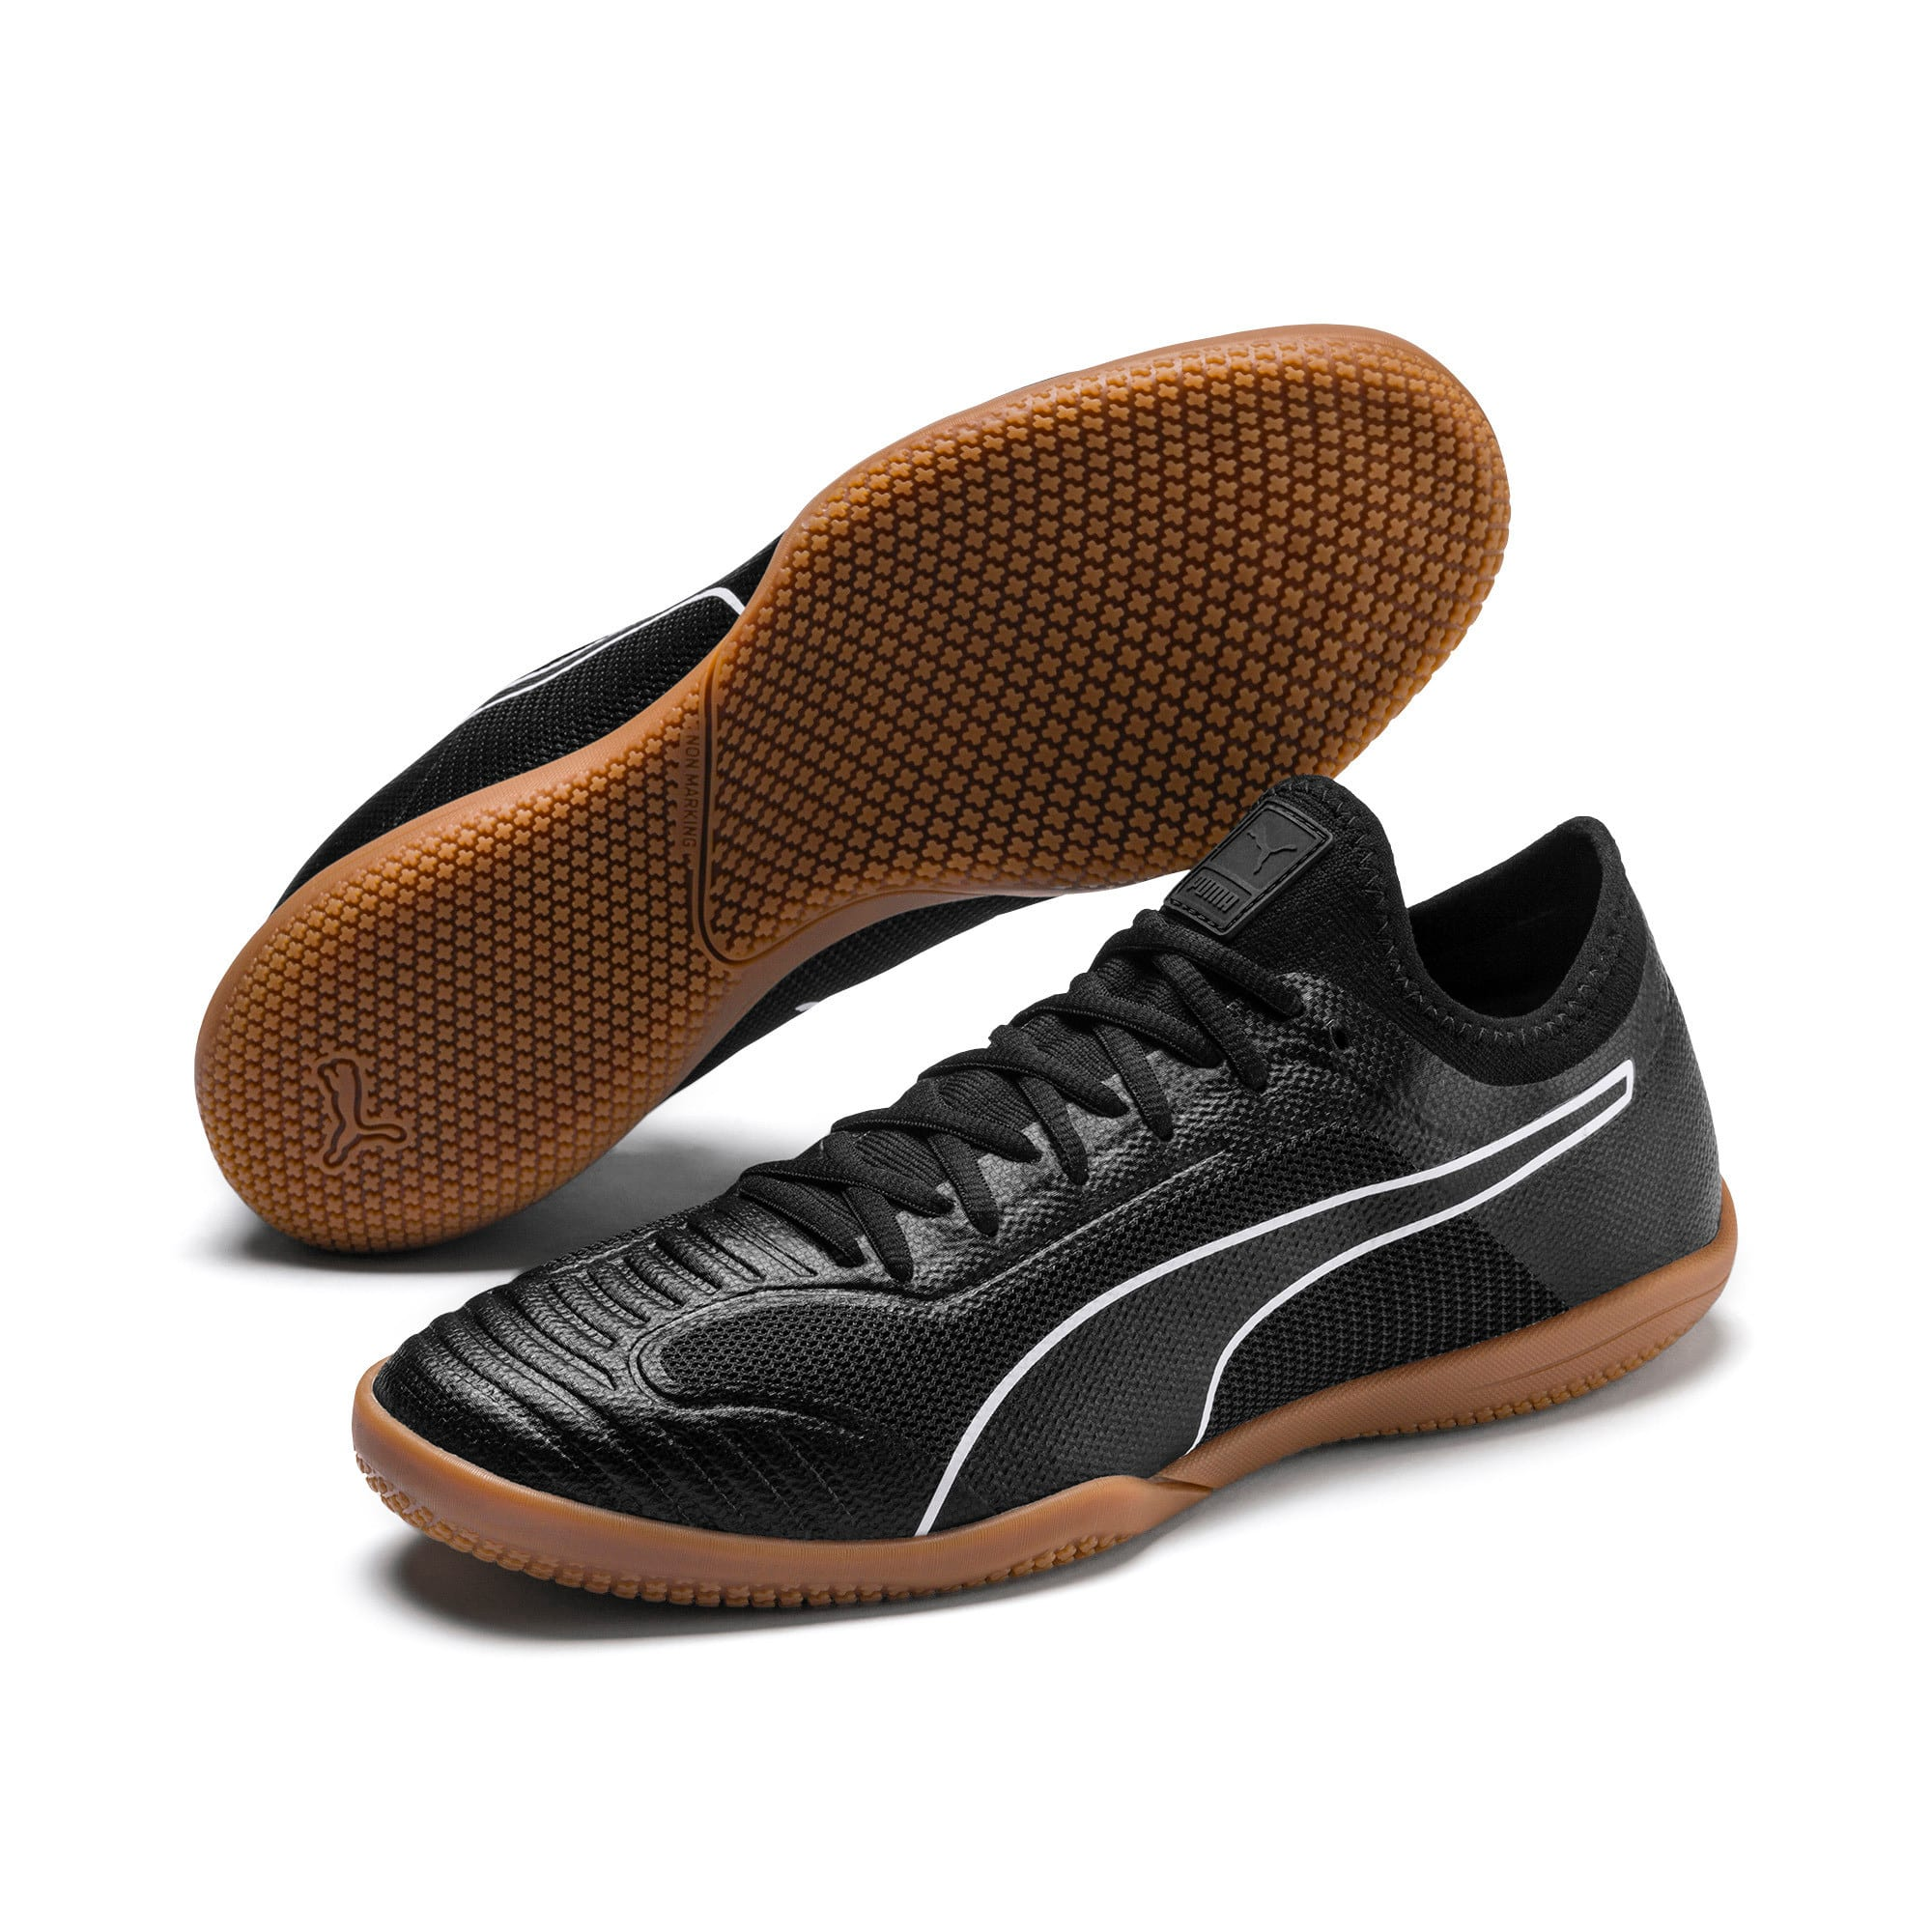 Thumbnail 3 of 365 Sala 1 Men's Football Boots, Puma Black-Puma White-Gum, medium